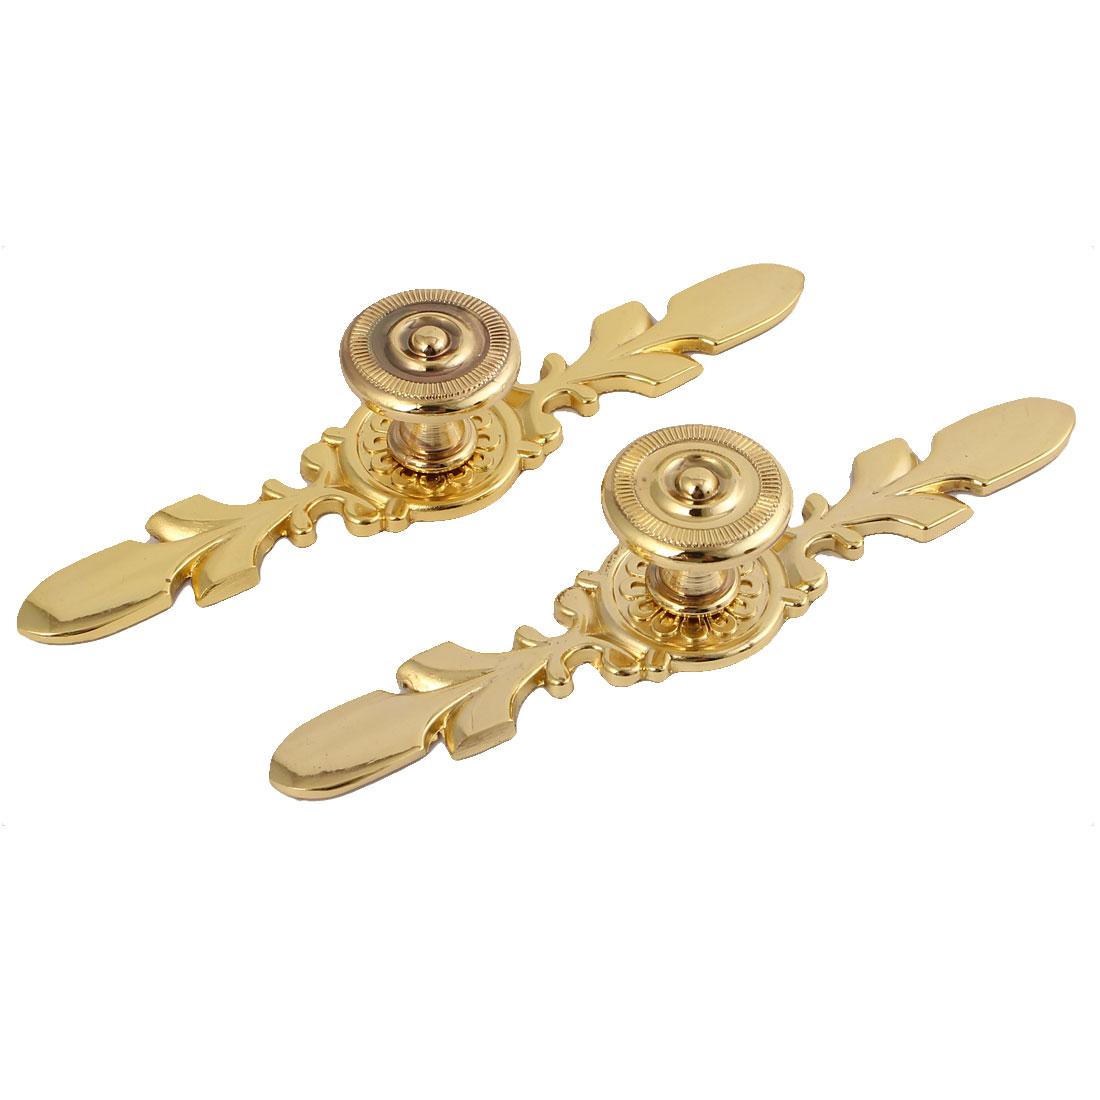 Wardrobe Drawer Door Retro Style Metal Pull Handle Gold Tone 2pcs